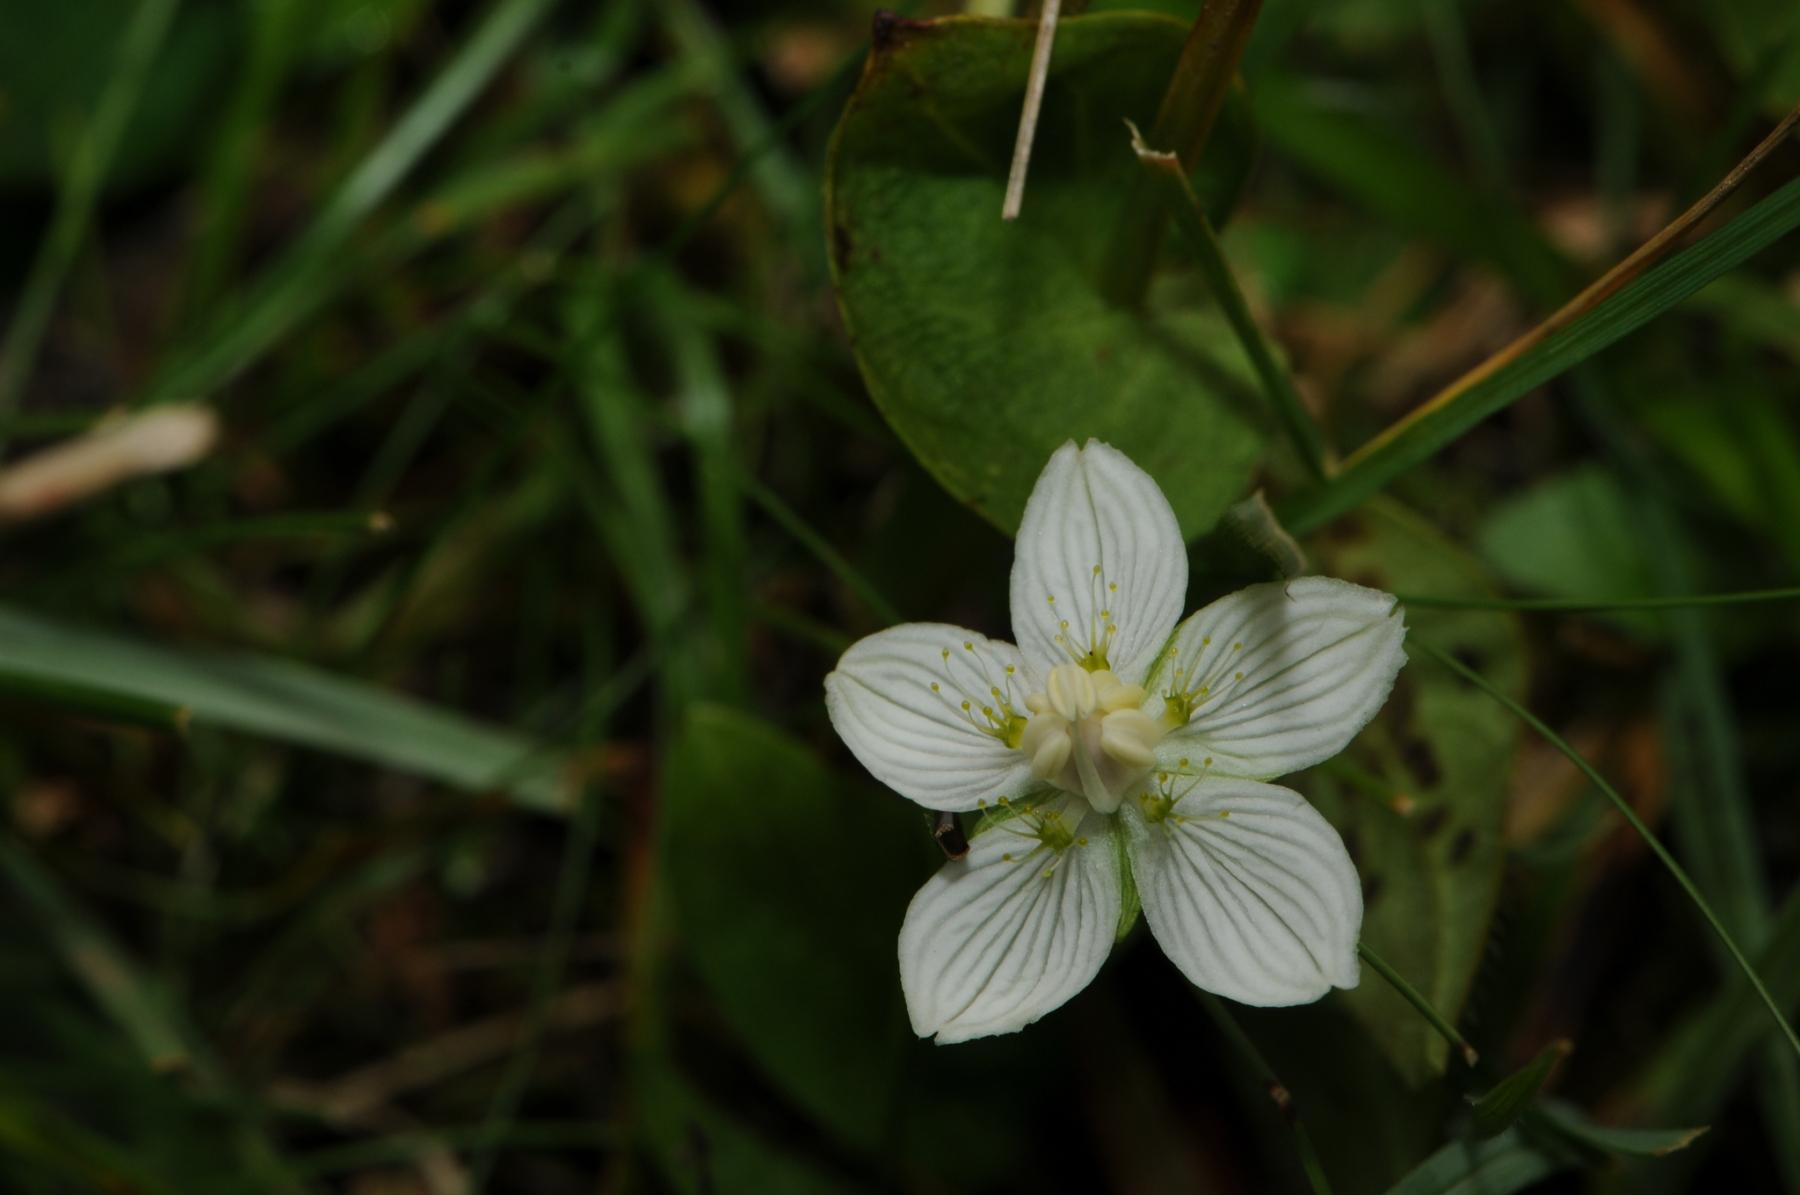 Grass-of-Parnassus (Parnassia palustris), Cressbrookdale, Derbyshire.